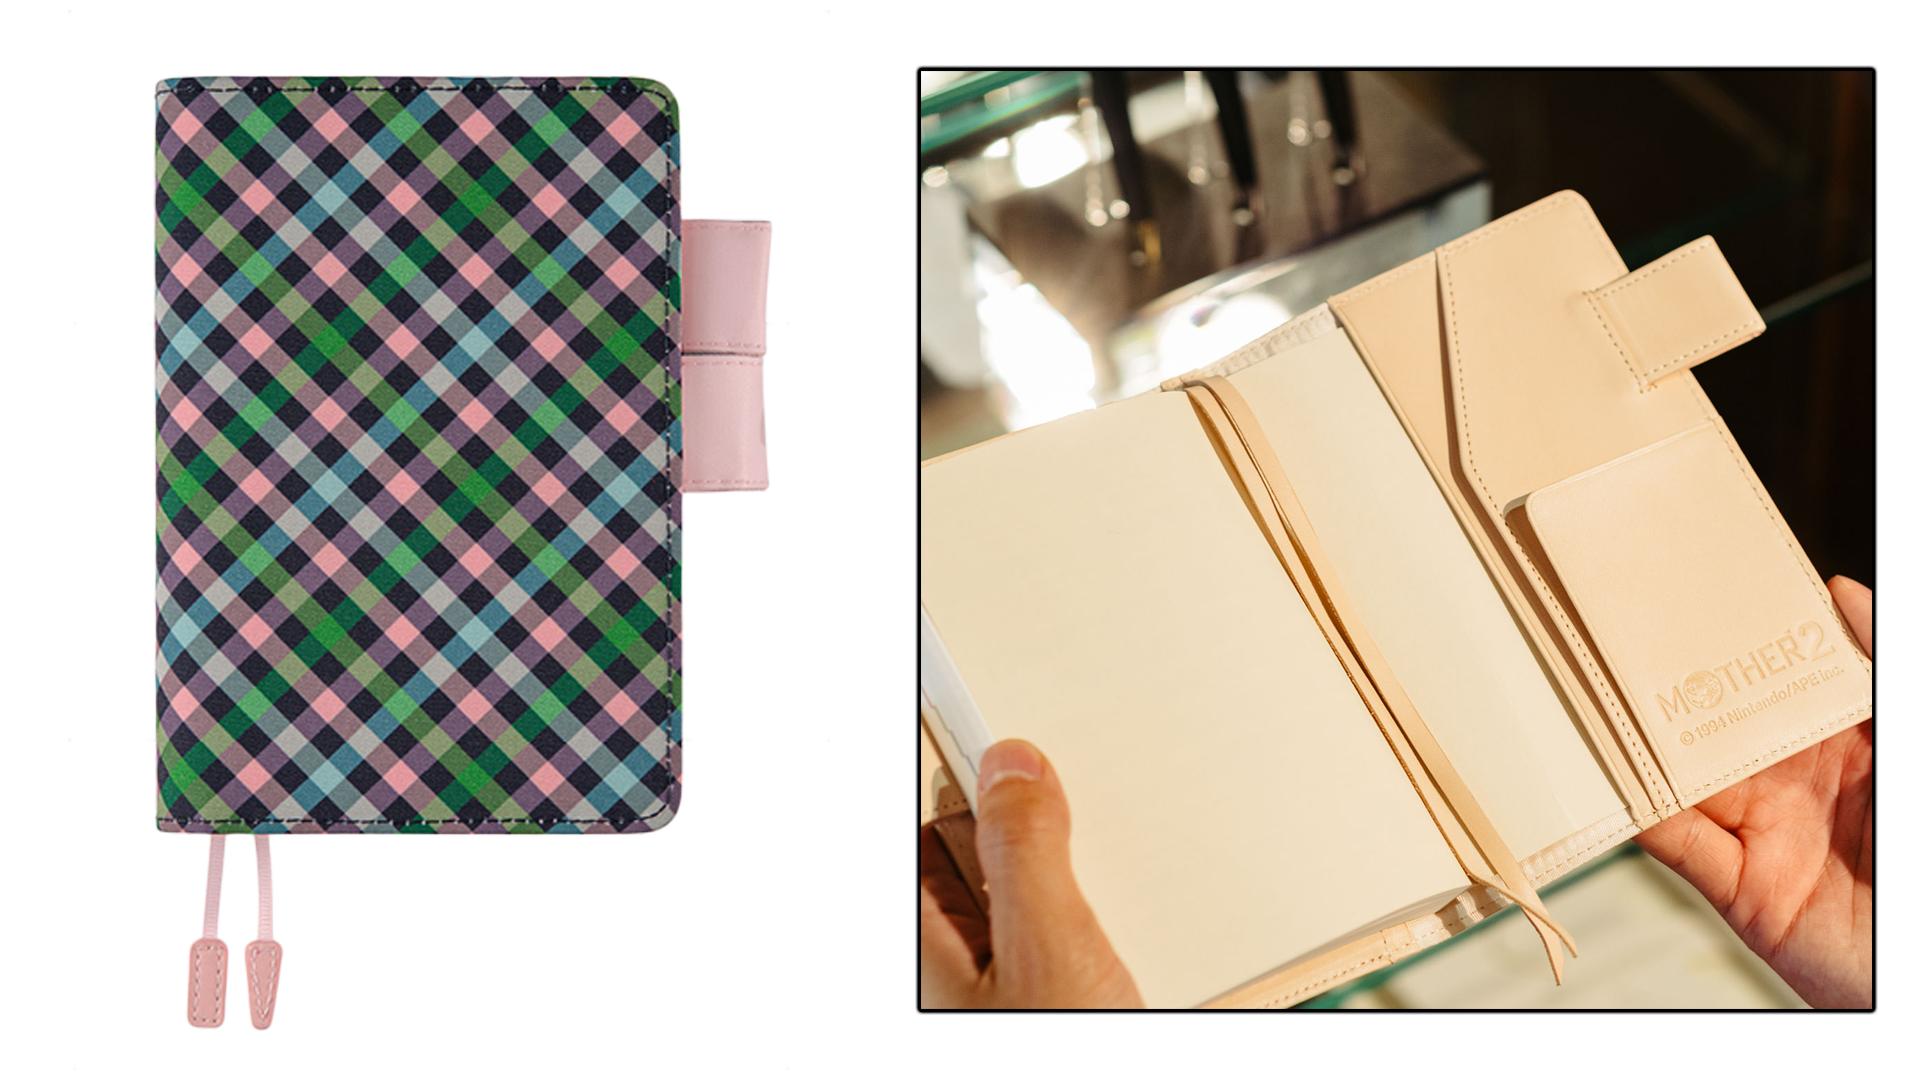 The Hobonichi Techo Yearly Notebook